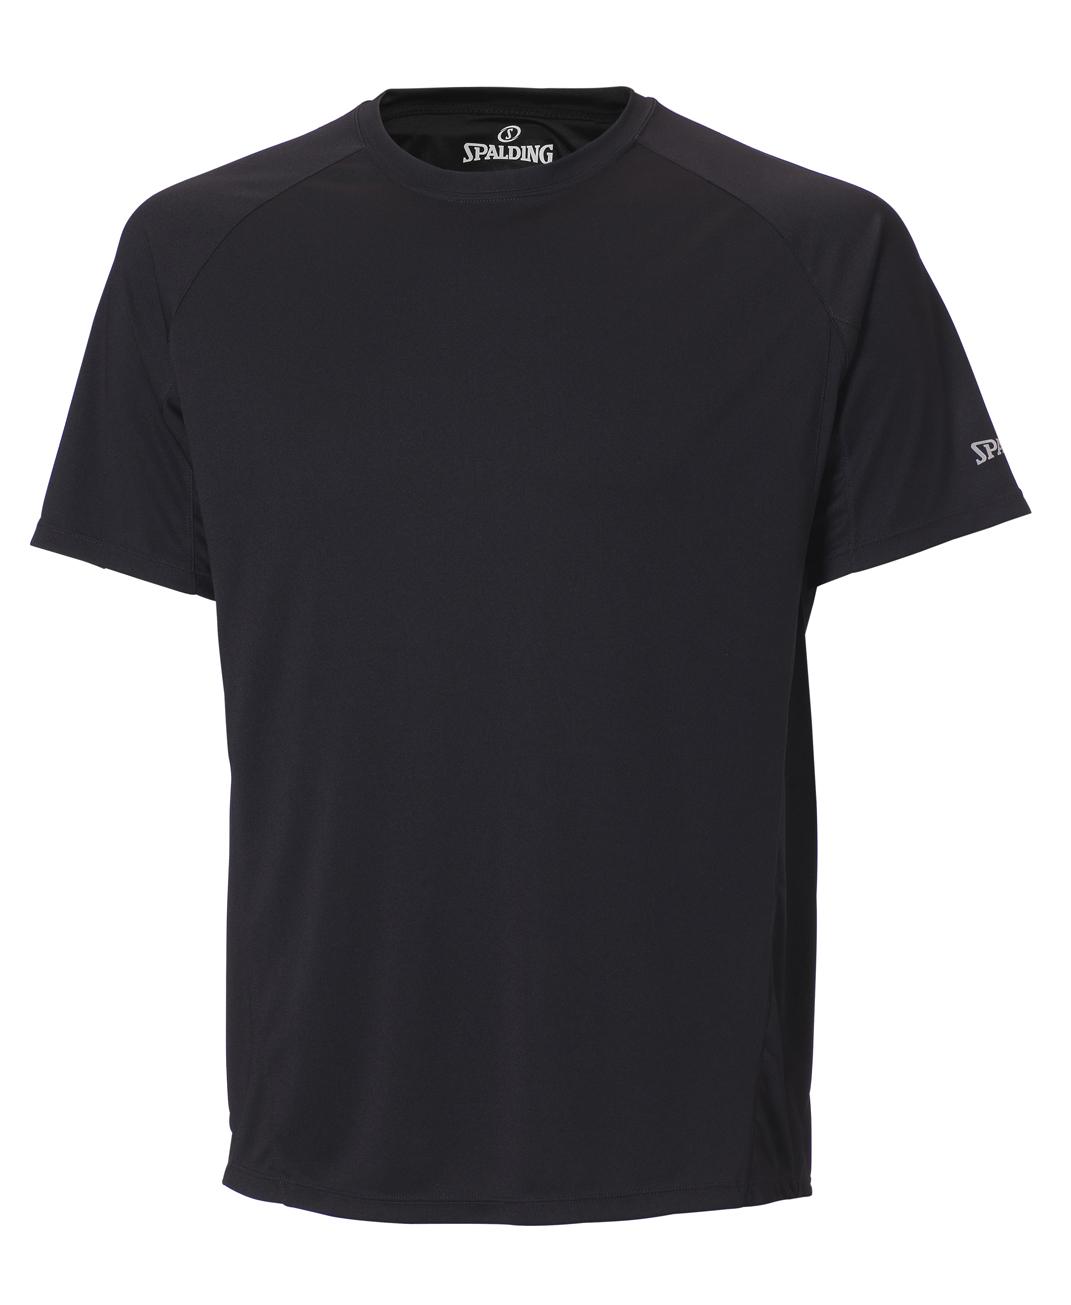 Spalding Heren Essential sport T-shirt Zwart